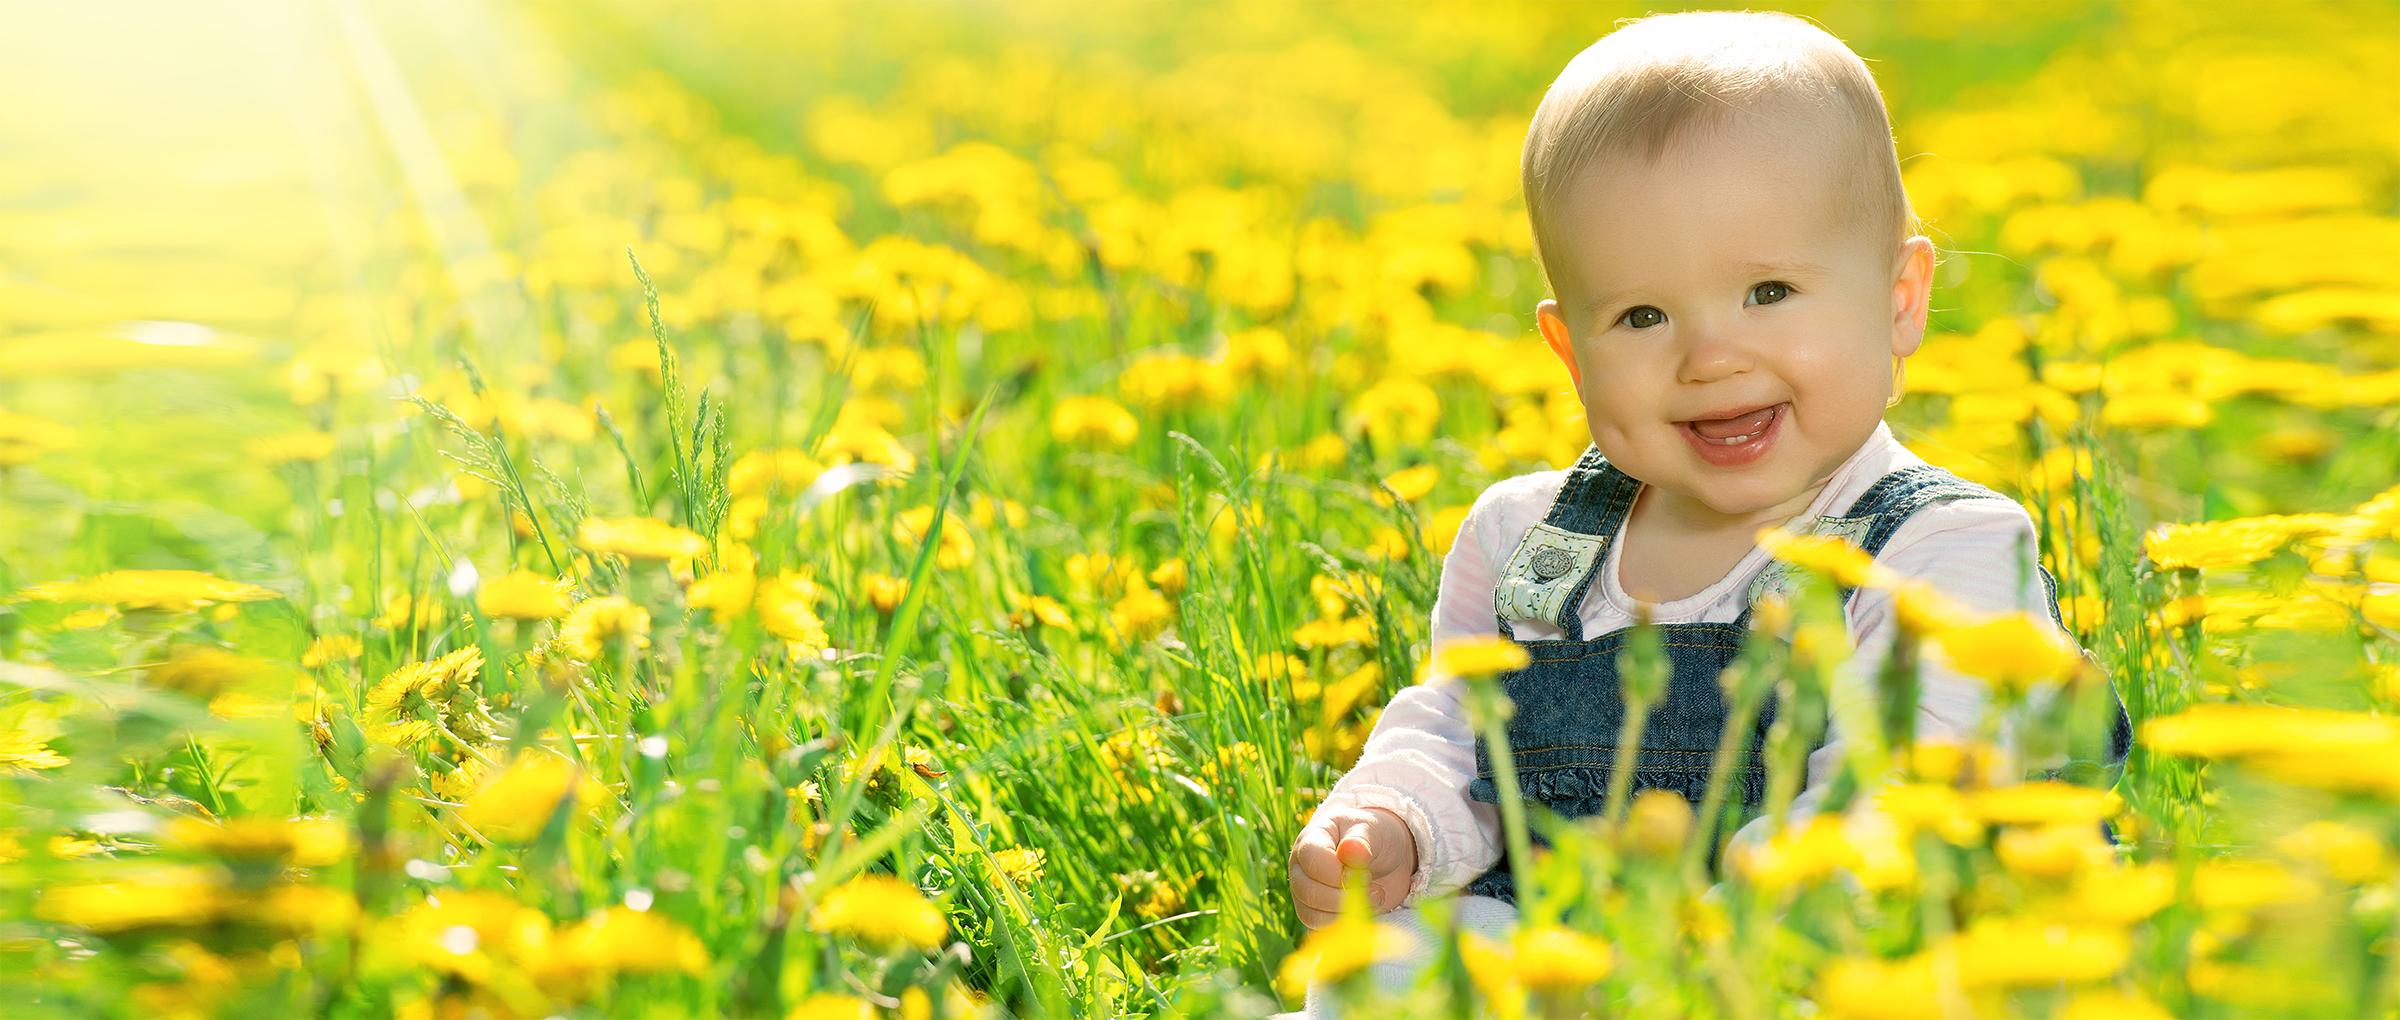 CT Fertility acudirá a la feria Surrofair